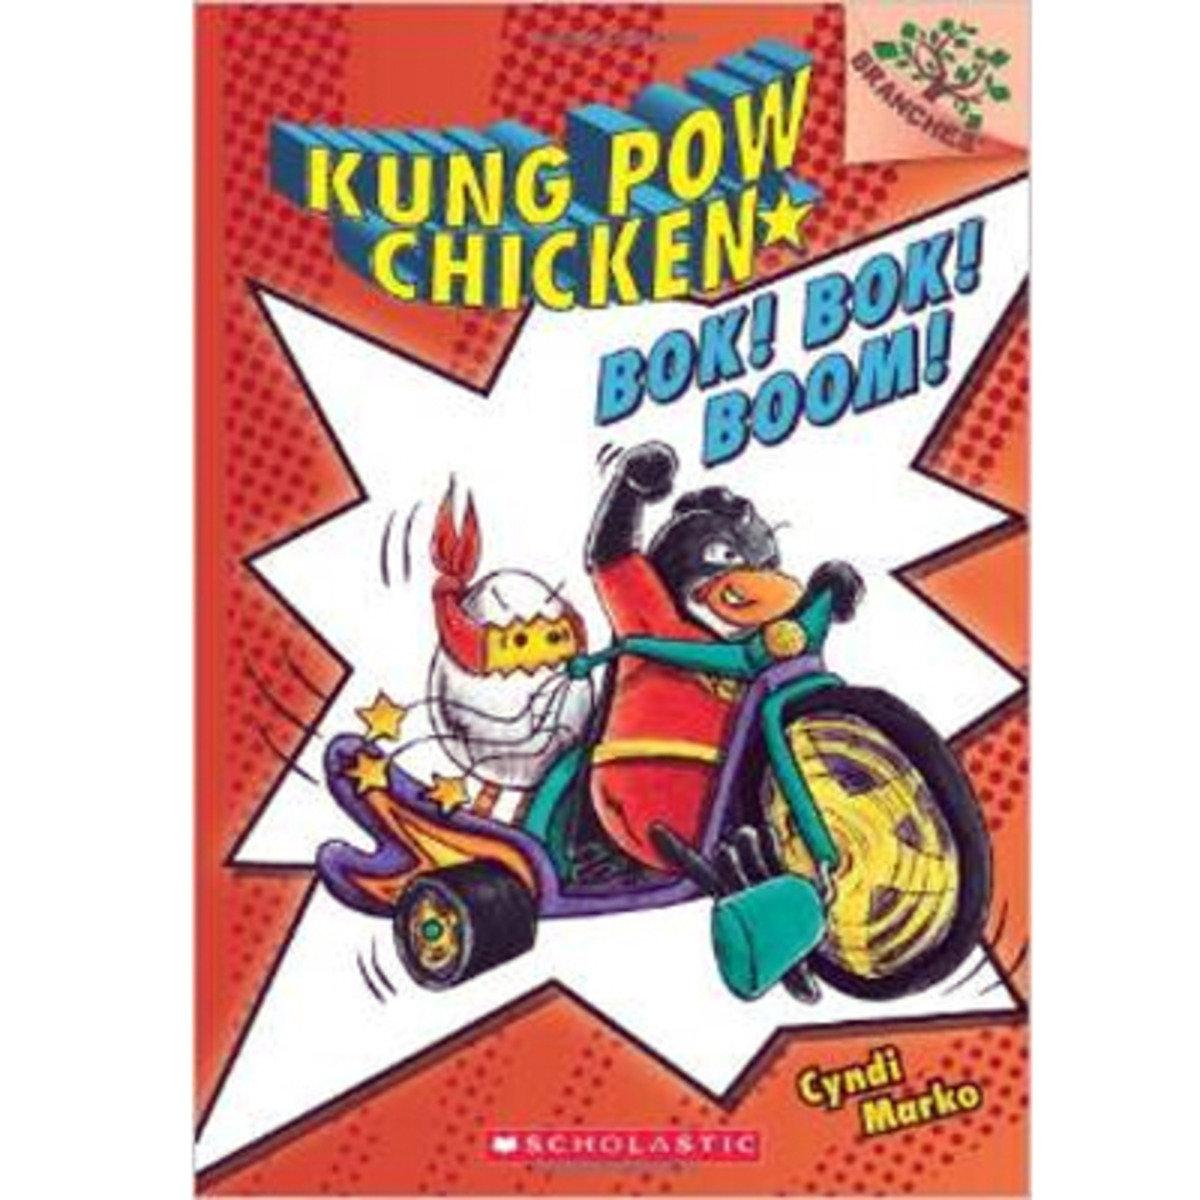 KUNG POW CHICKEN: BOK! BOK! BOOM! 9780545610636